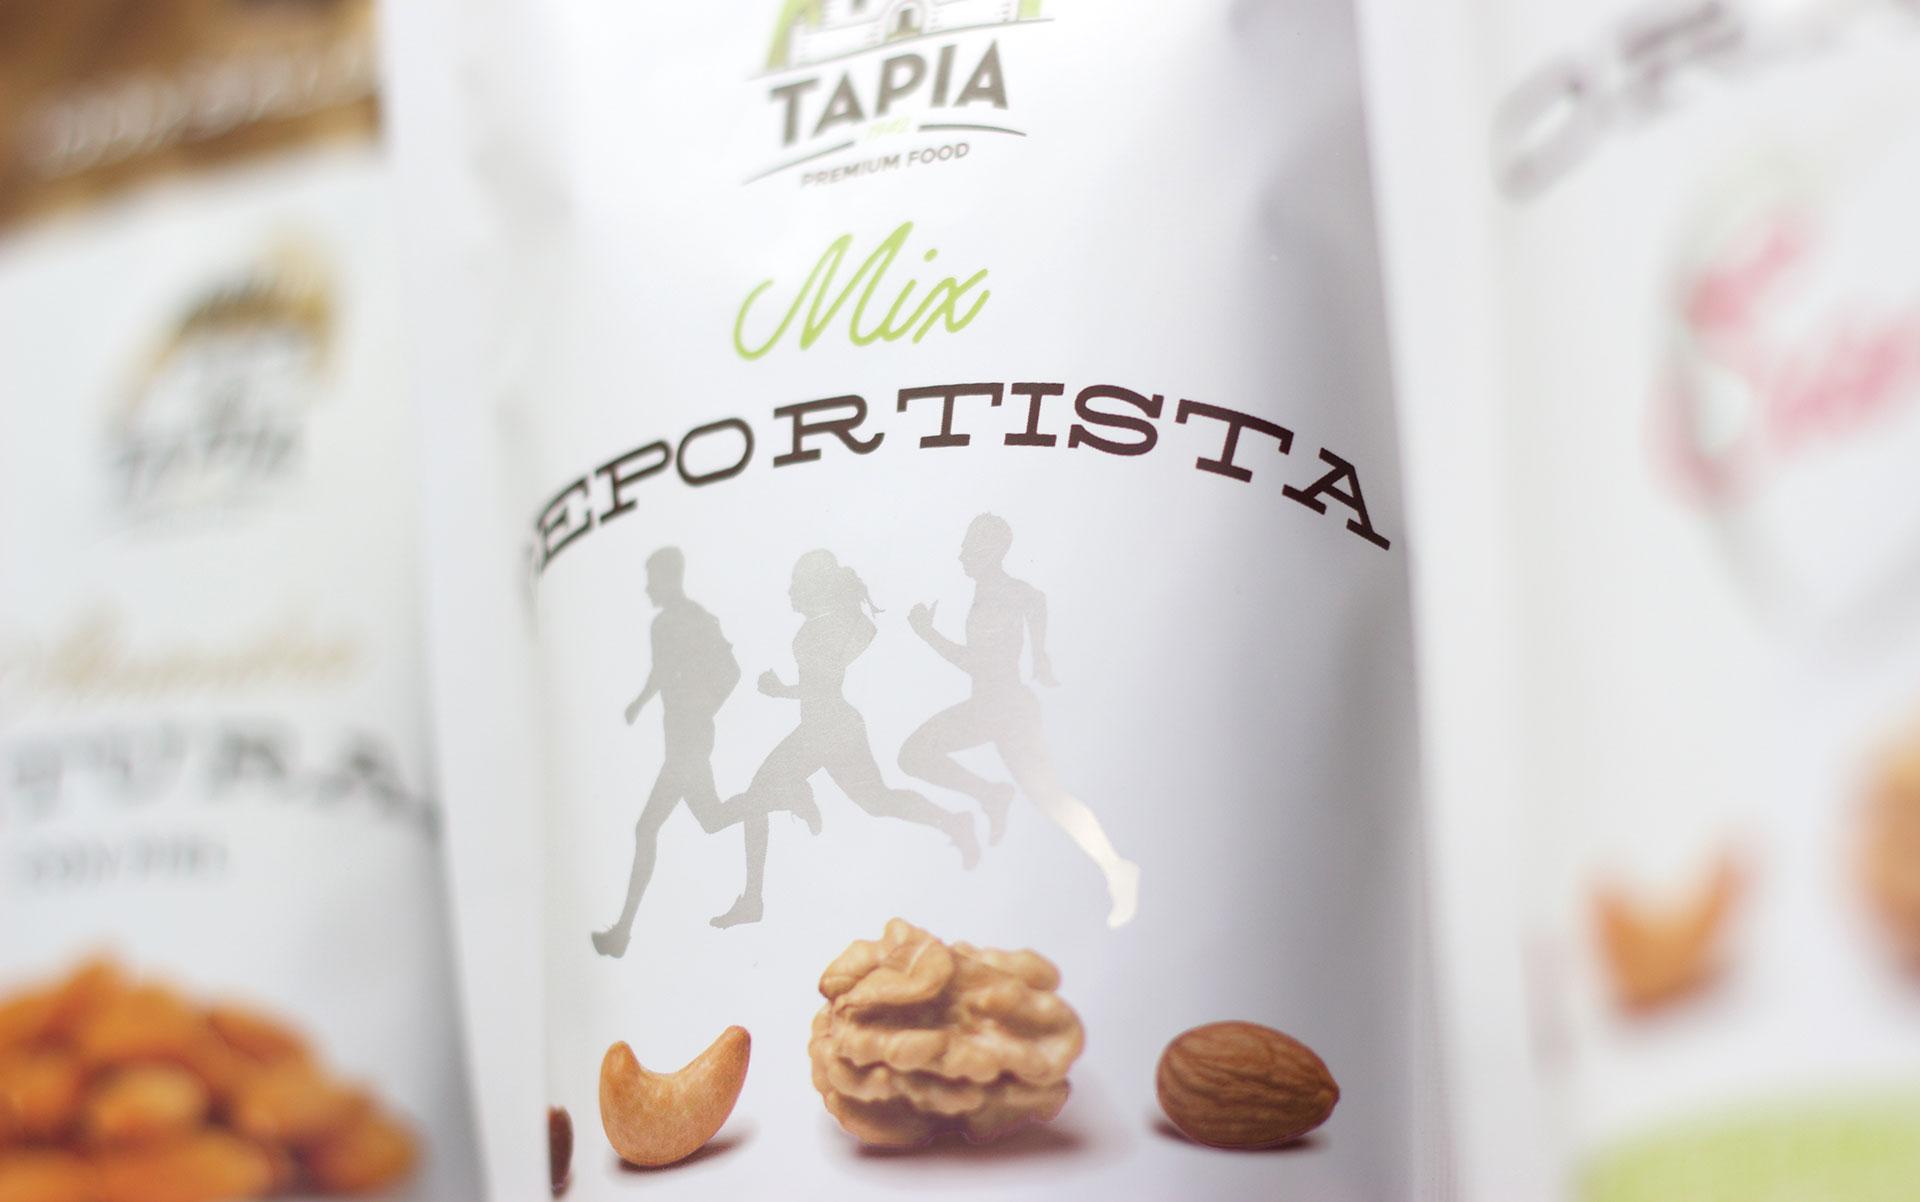 Detalle de diseño del packaging de Tapia